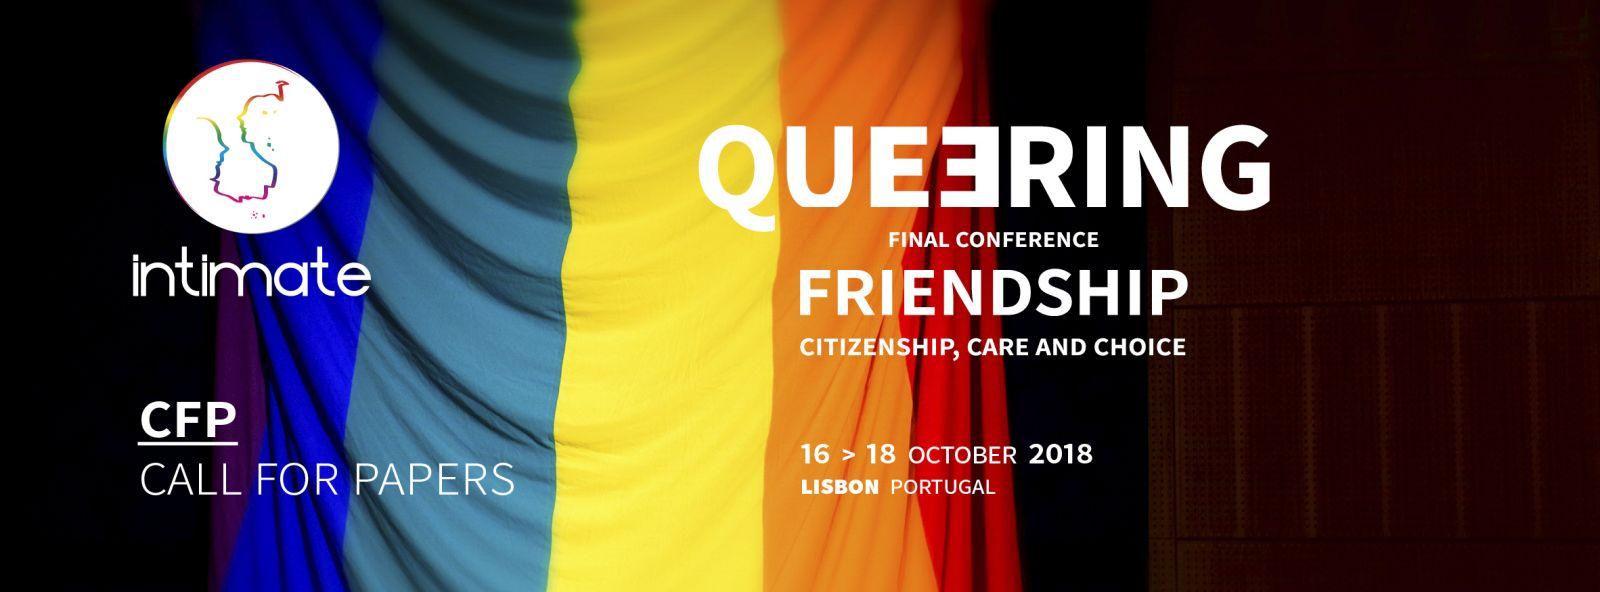 "Queering Friendship [16-18 October 2018, Lisbon]<span id=""edit_19159""><script>$(function() { $('#edit_19159').load( ""/myces/user/editobj.php?tipo=destaque&id=19159"" ); });</script></span>"